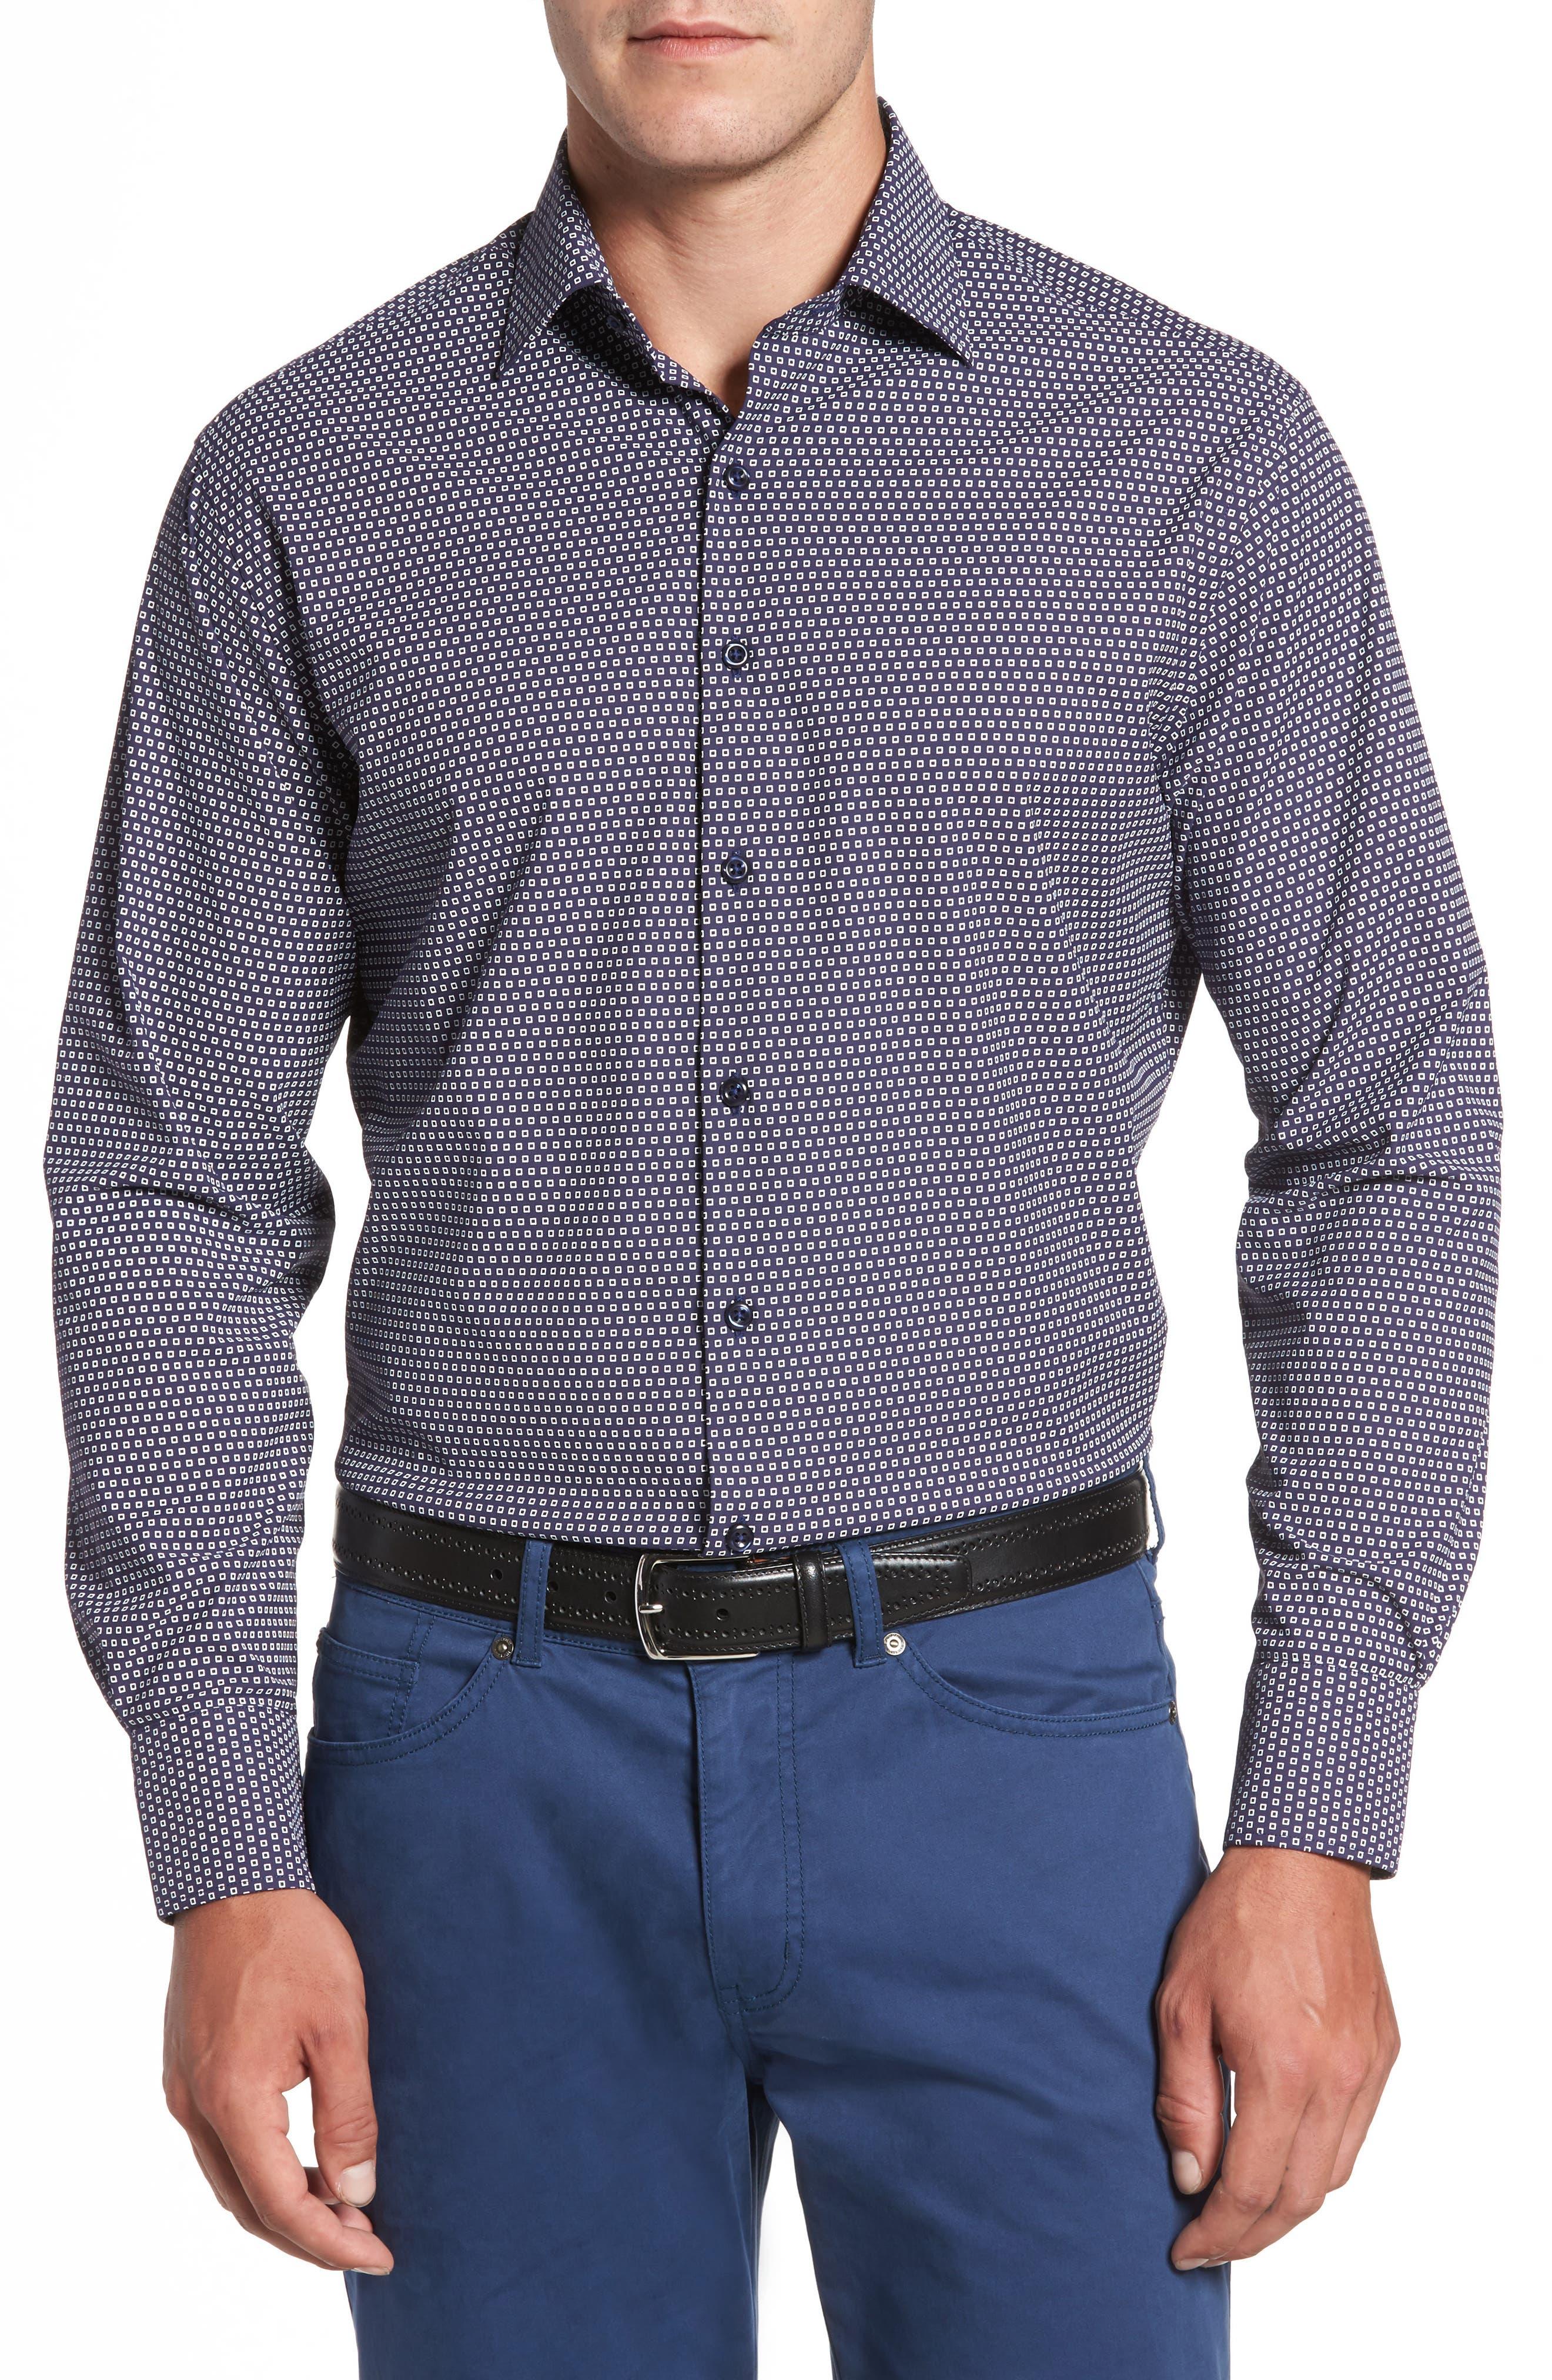 Chex Regular Fit Performance Sport Shirt,                         Main,                         color, Yankee Blue